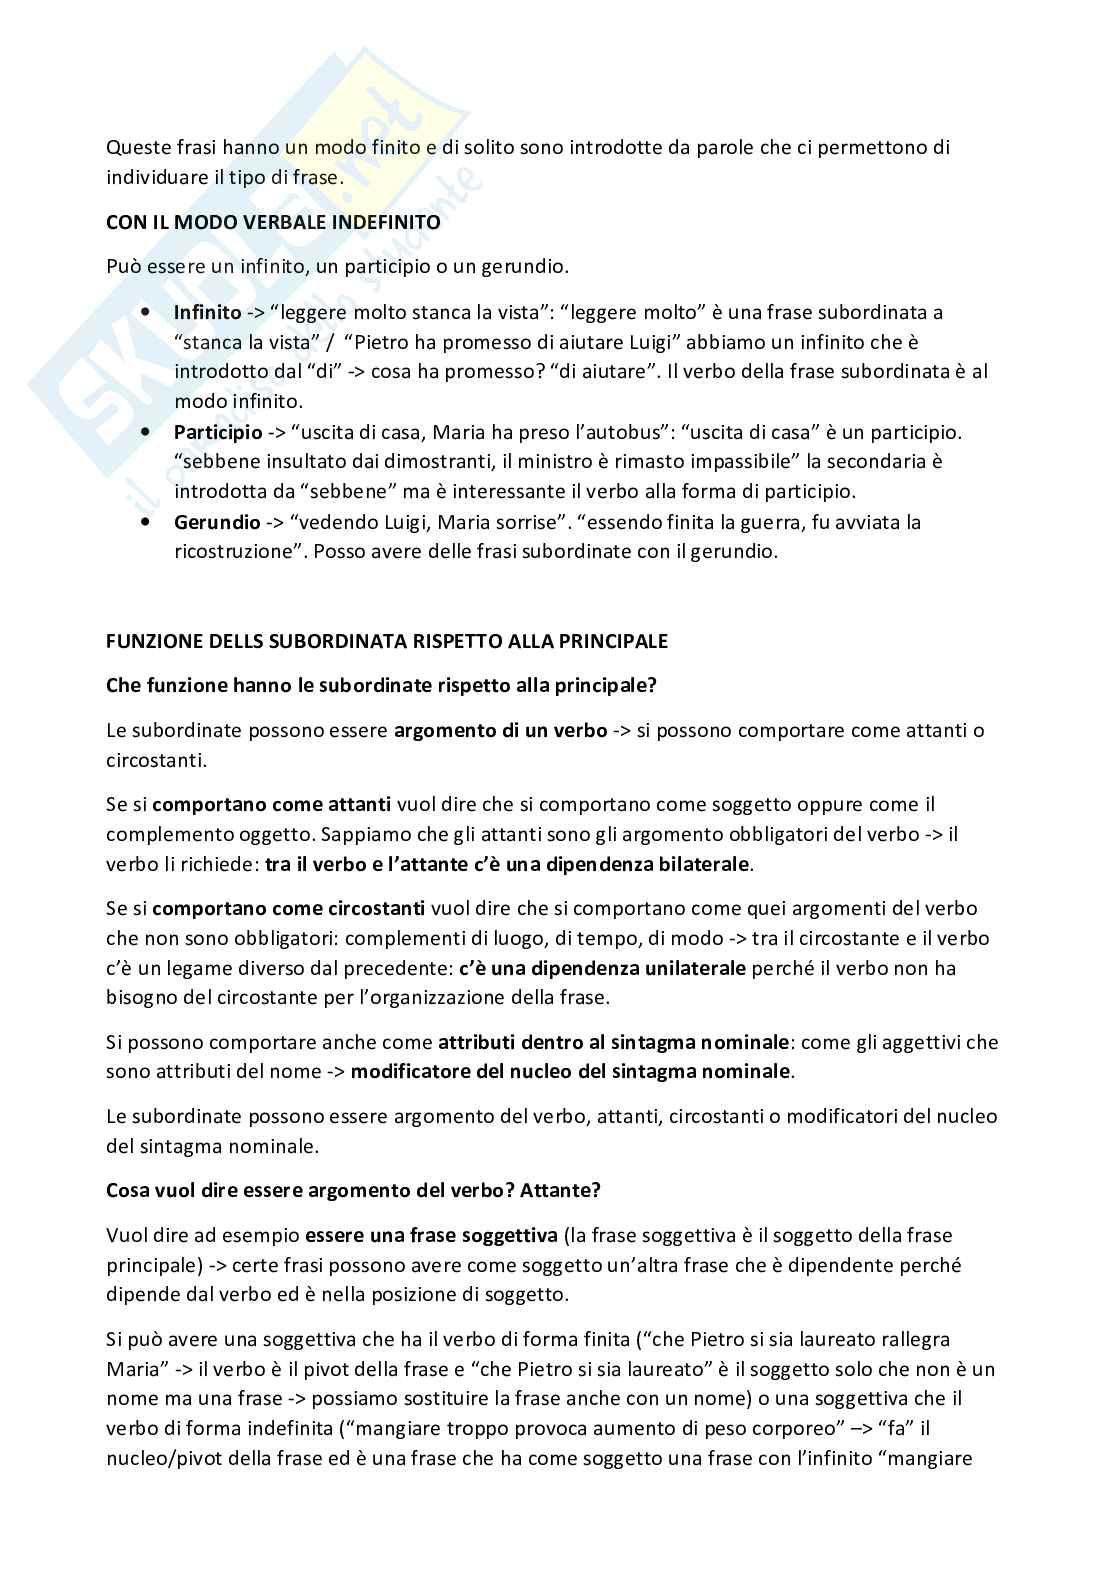 Linguistica generale - appunti Pag. 11